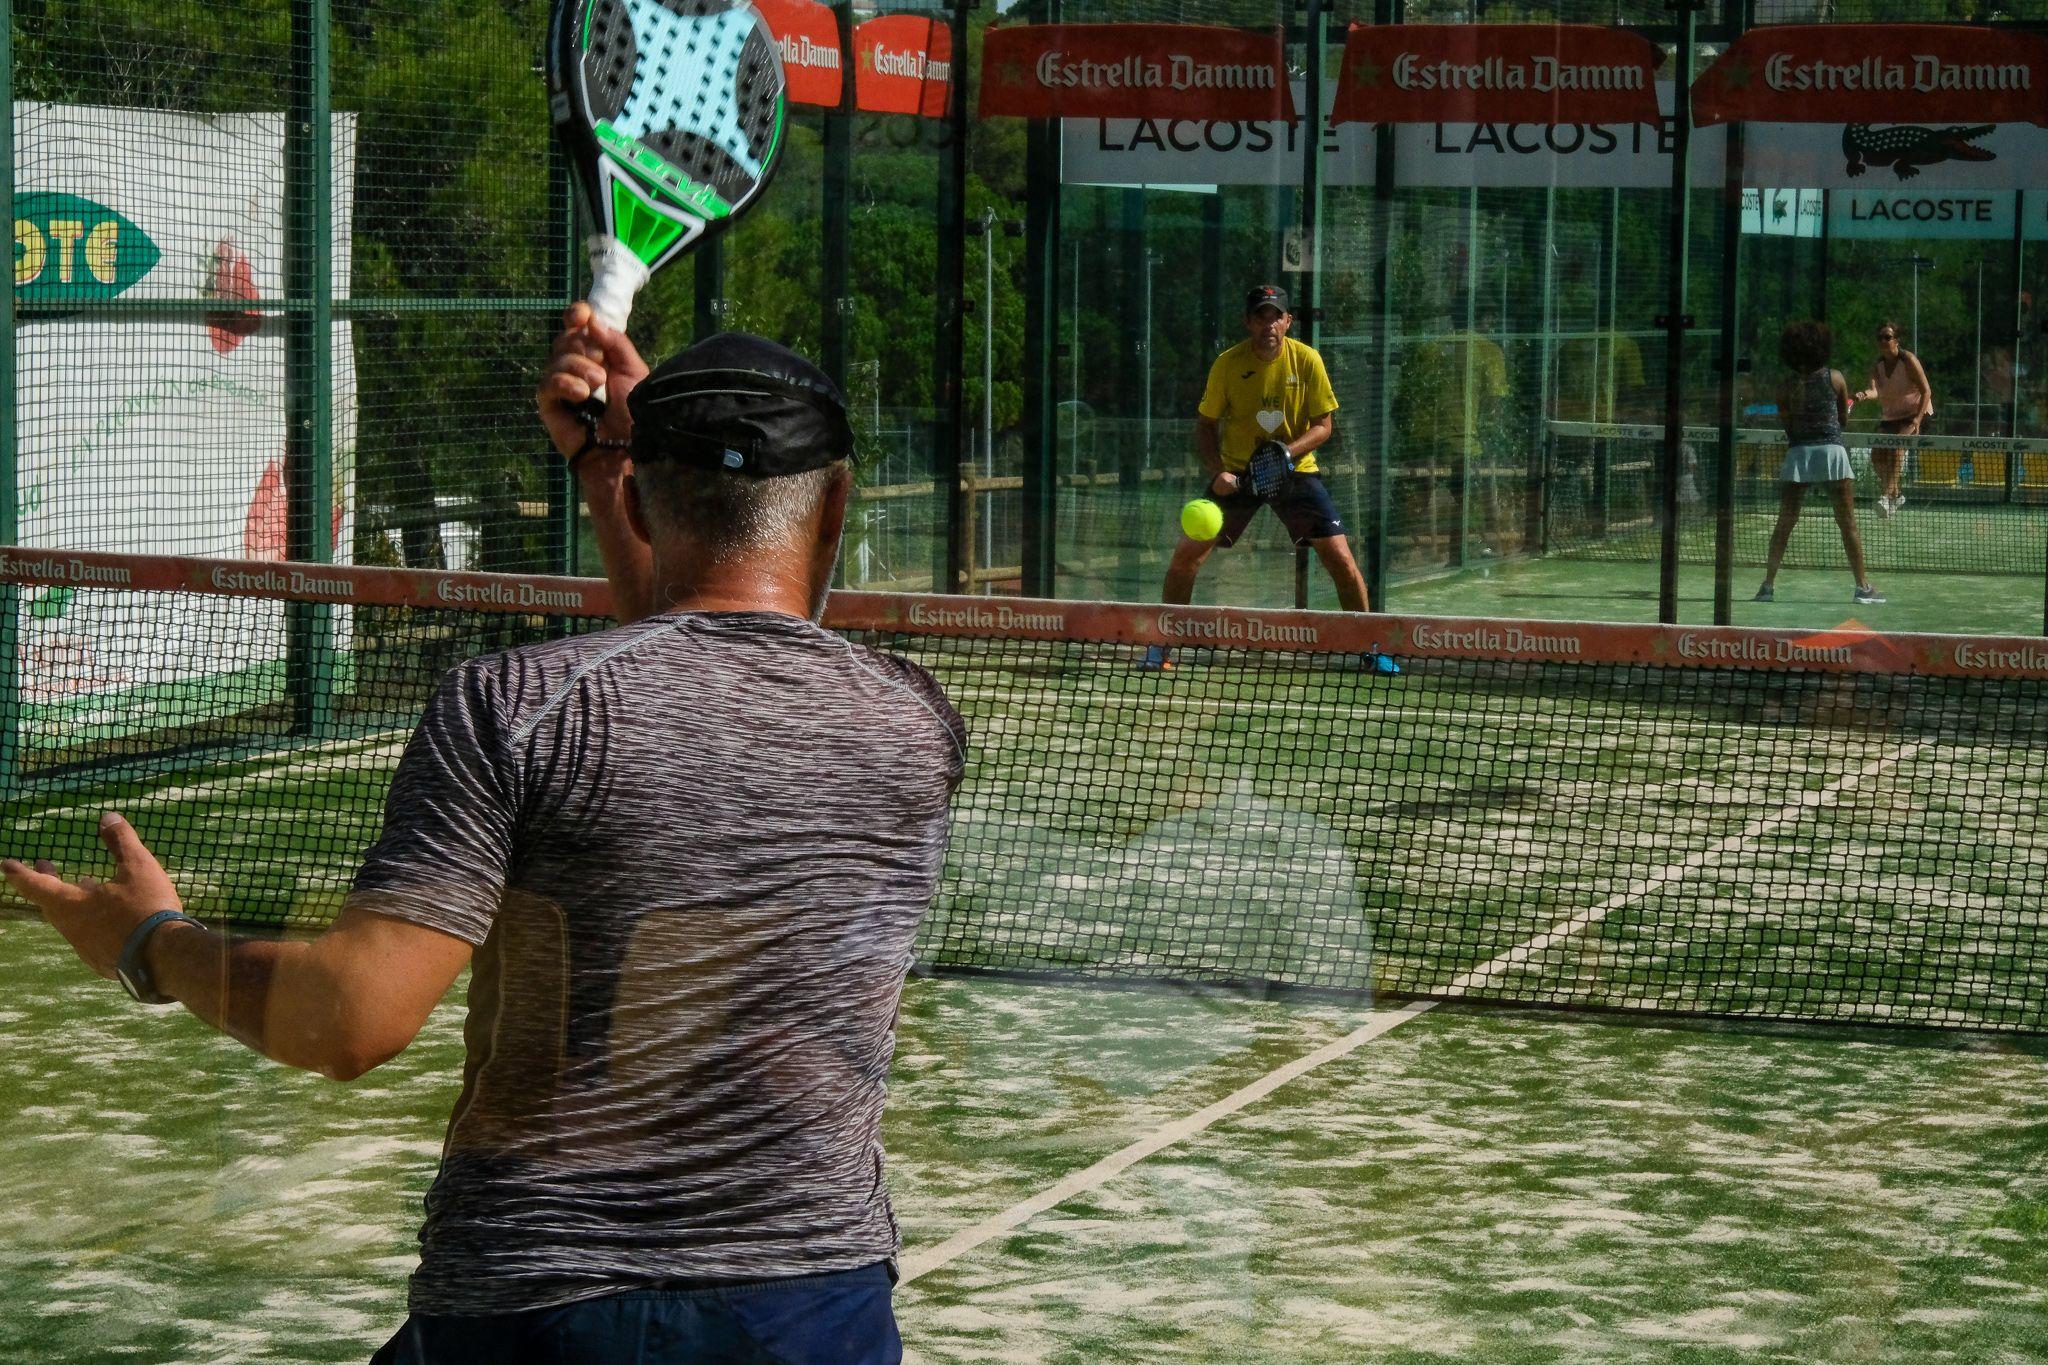 Torneigs d'esports al Club esportiu de Valldoreix. Foto: Ale Gómez